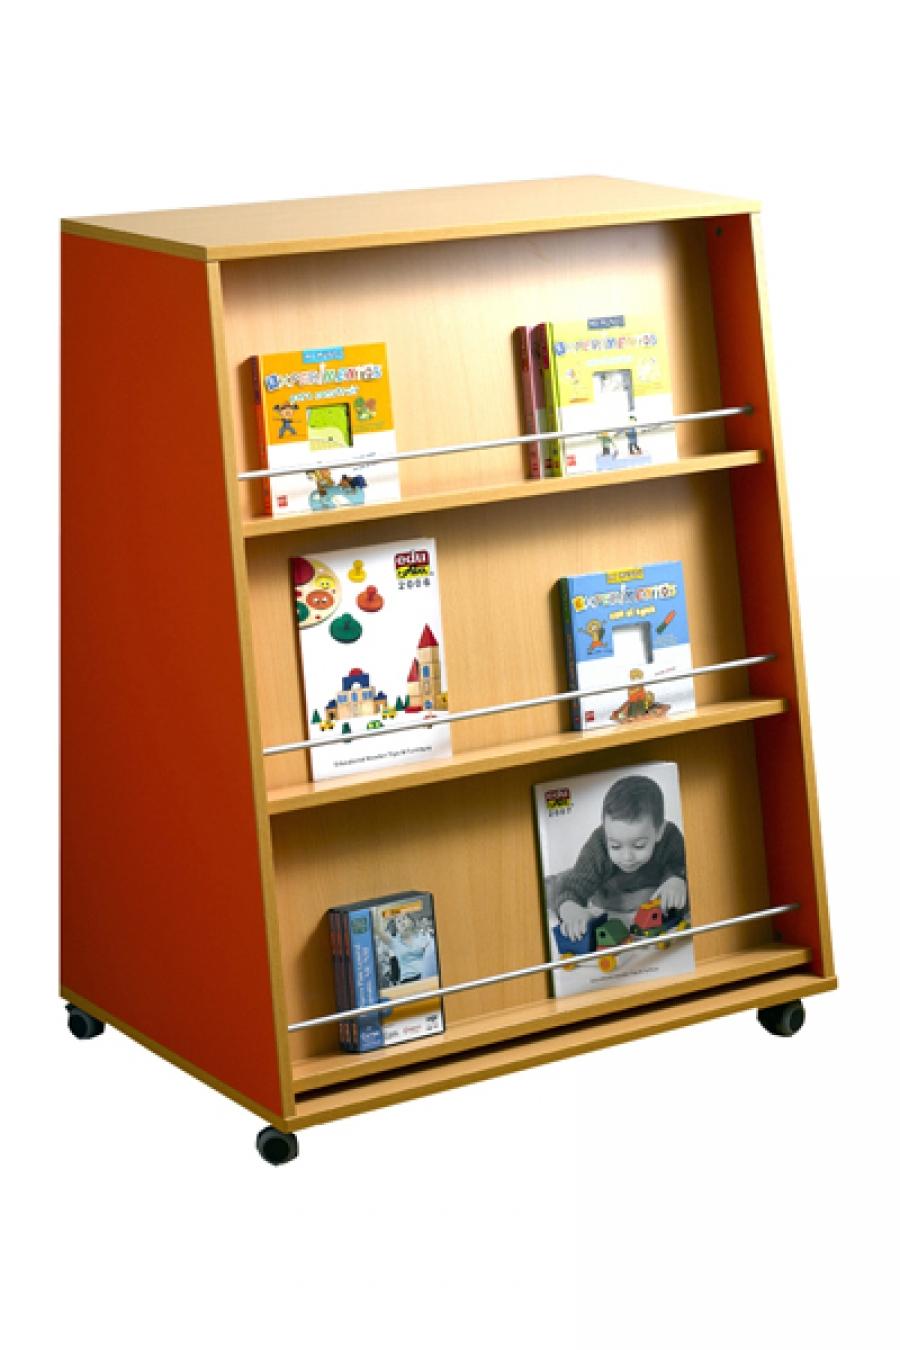 Muebles expositores de libros for Libro de muebles de melamina